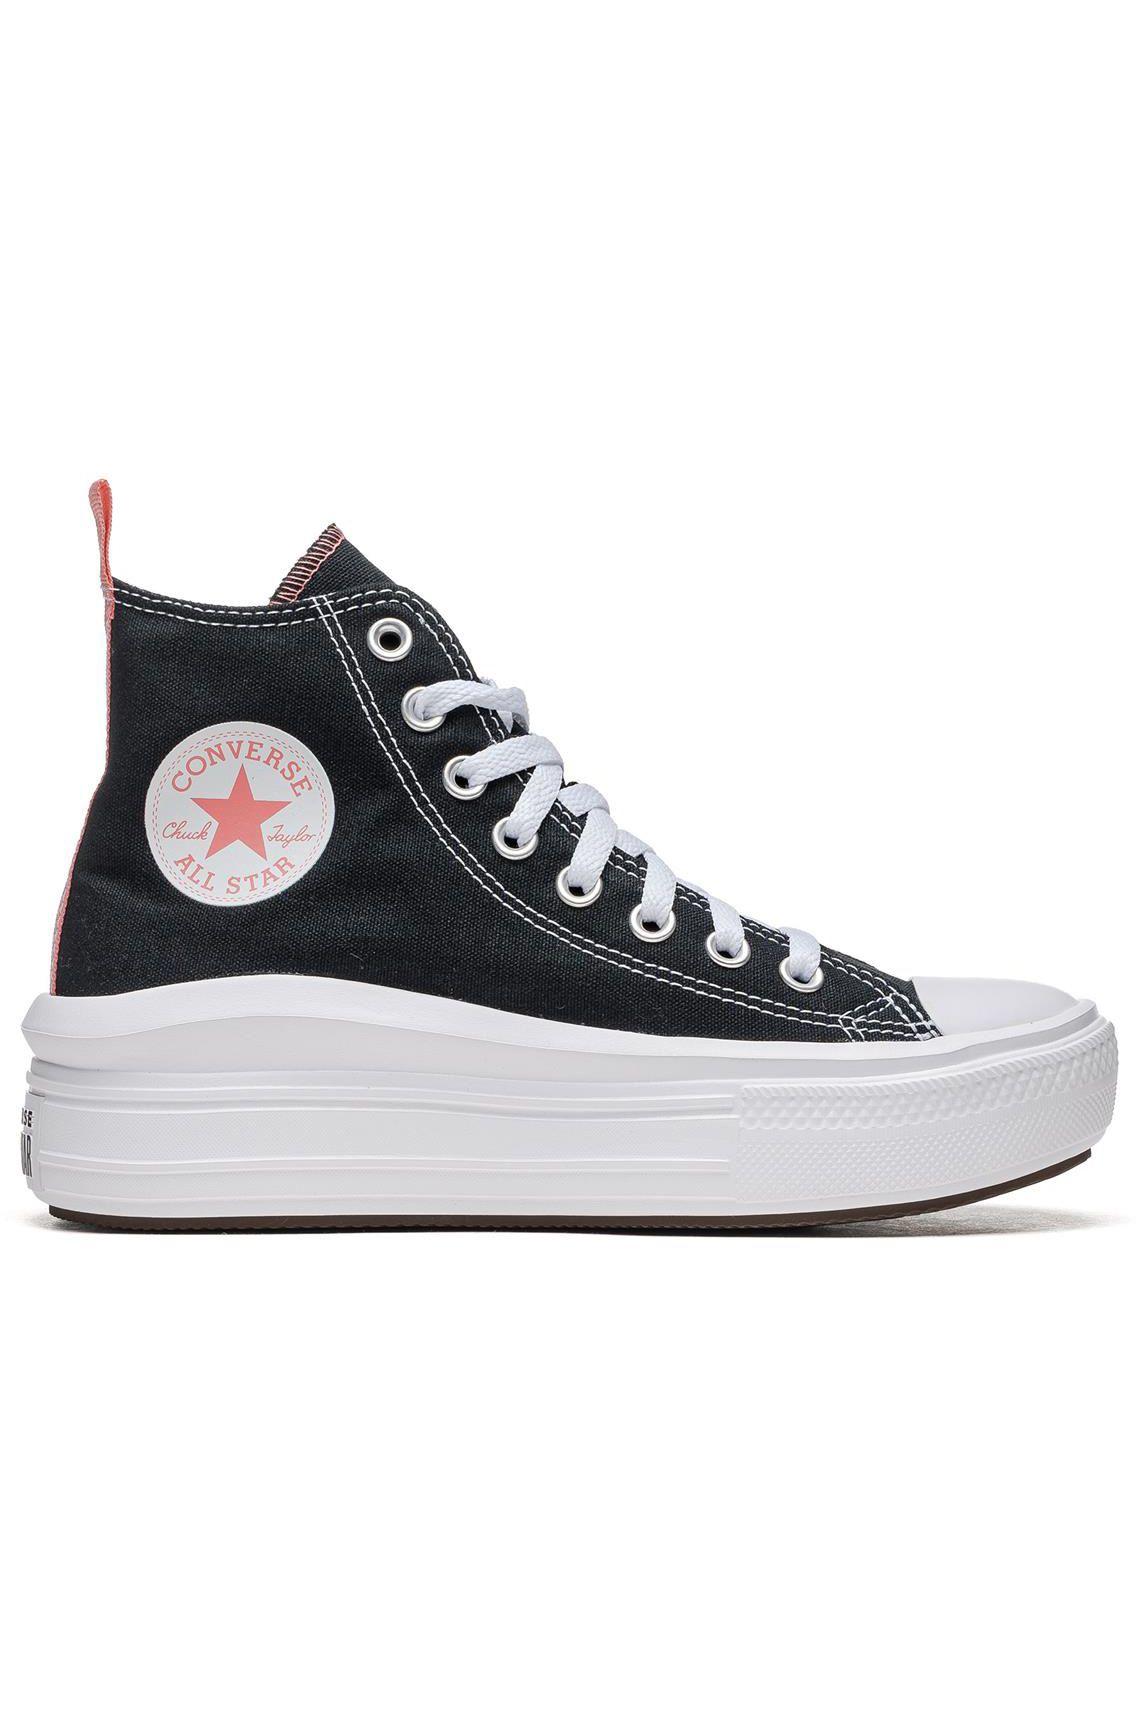 Tenis Converse CHUCK TAYLOR ALL STAR MOVE HI Black/Pink Salt/White